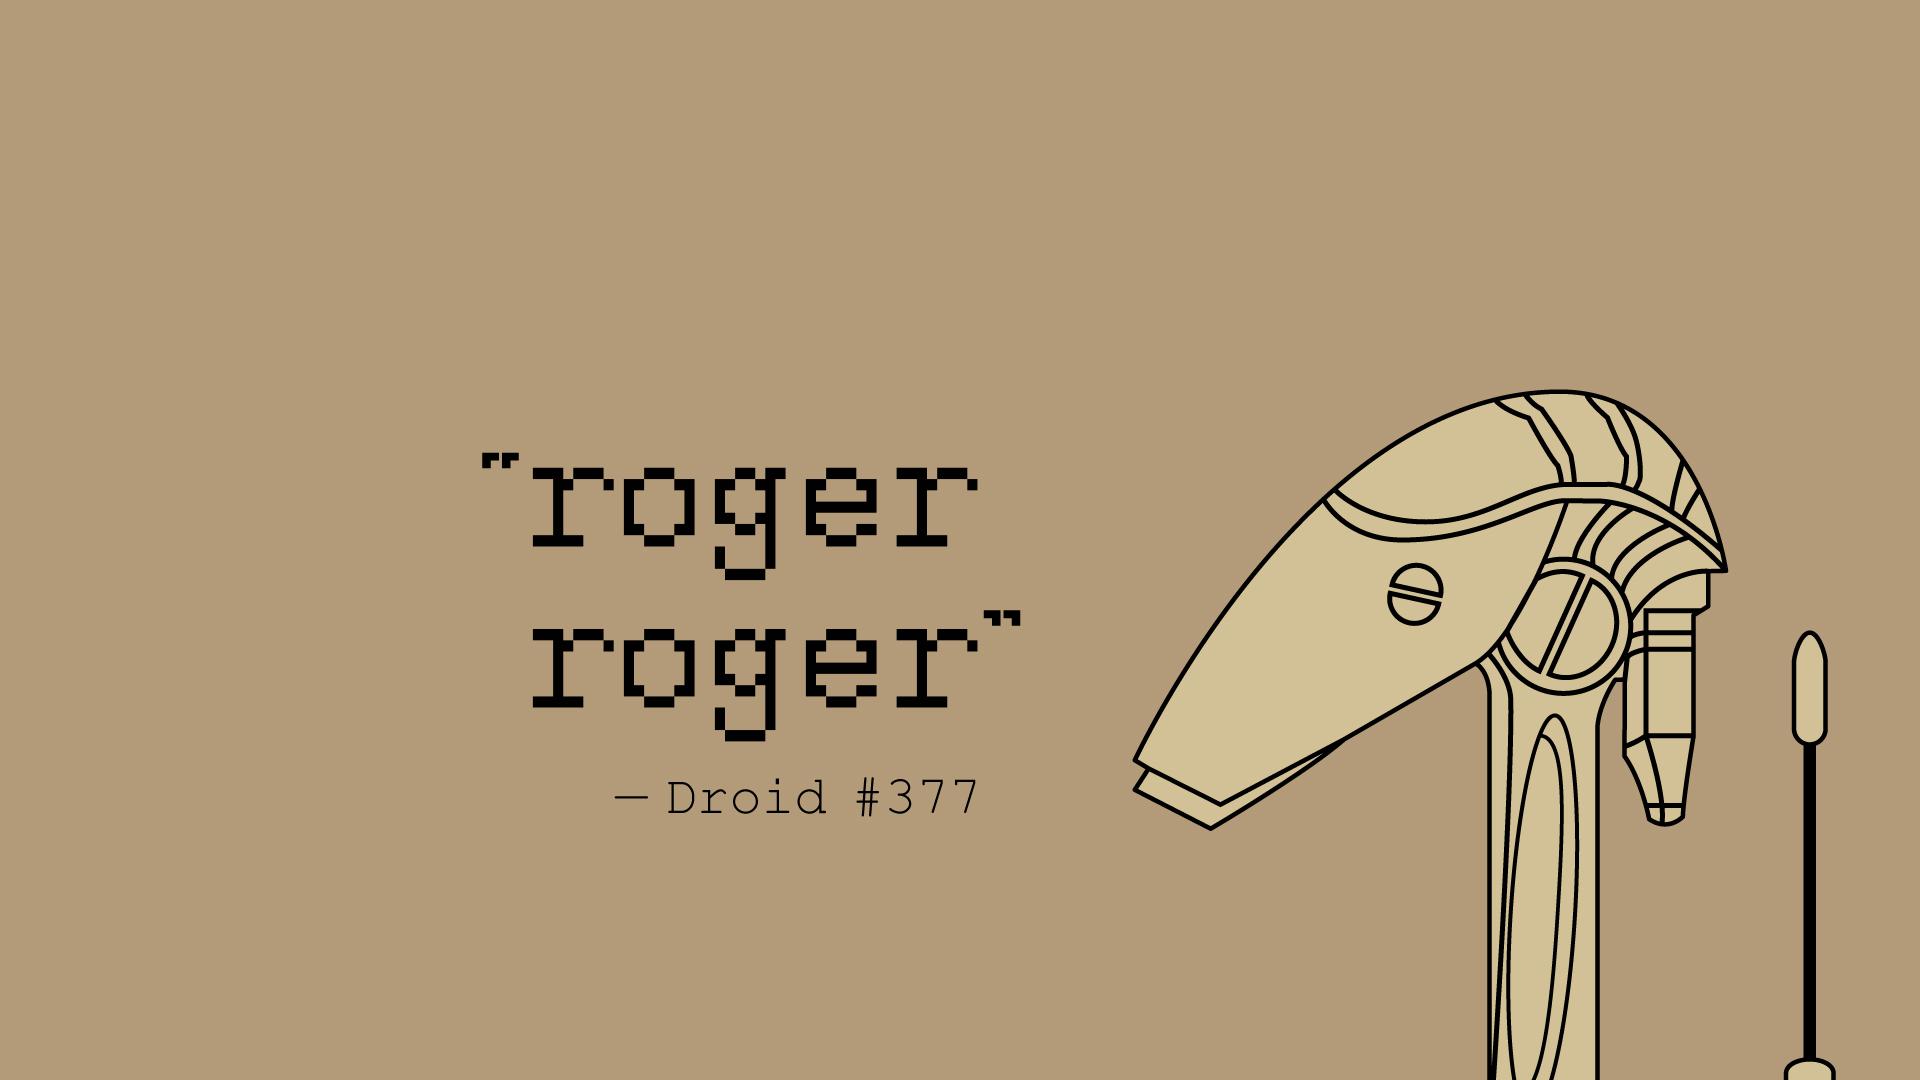 Roger Roger Droids wallpaper